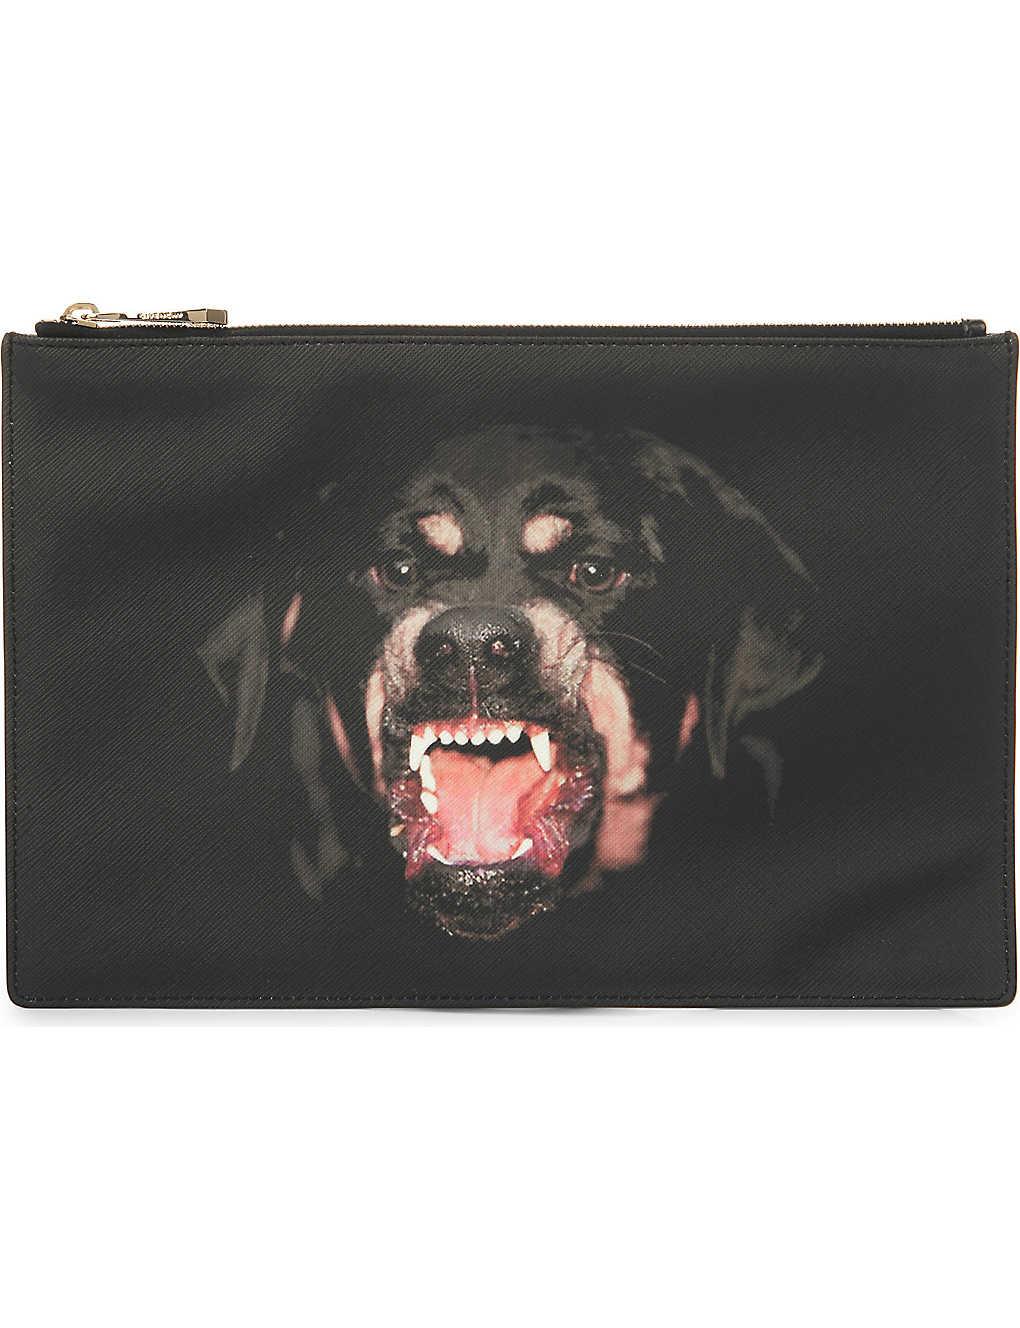 GIVENCHY - Rottweiler medium pouch  5f926491c6902